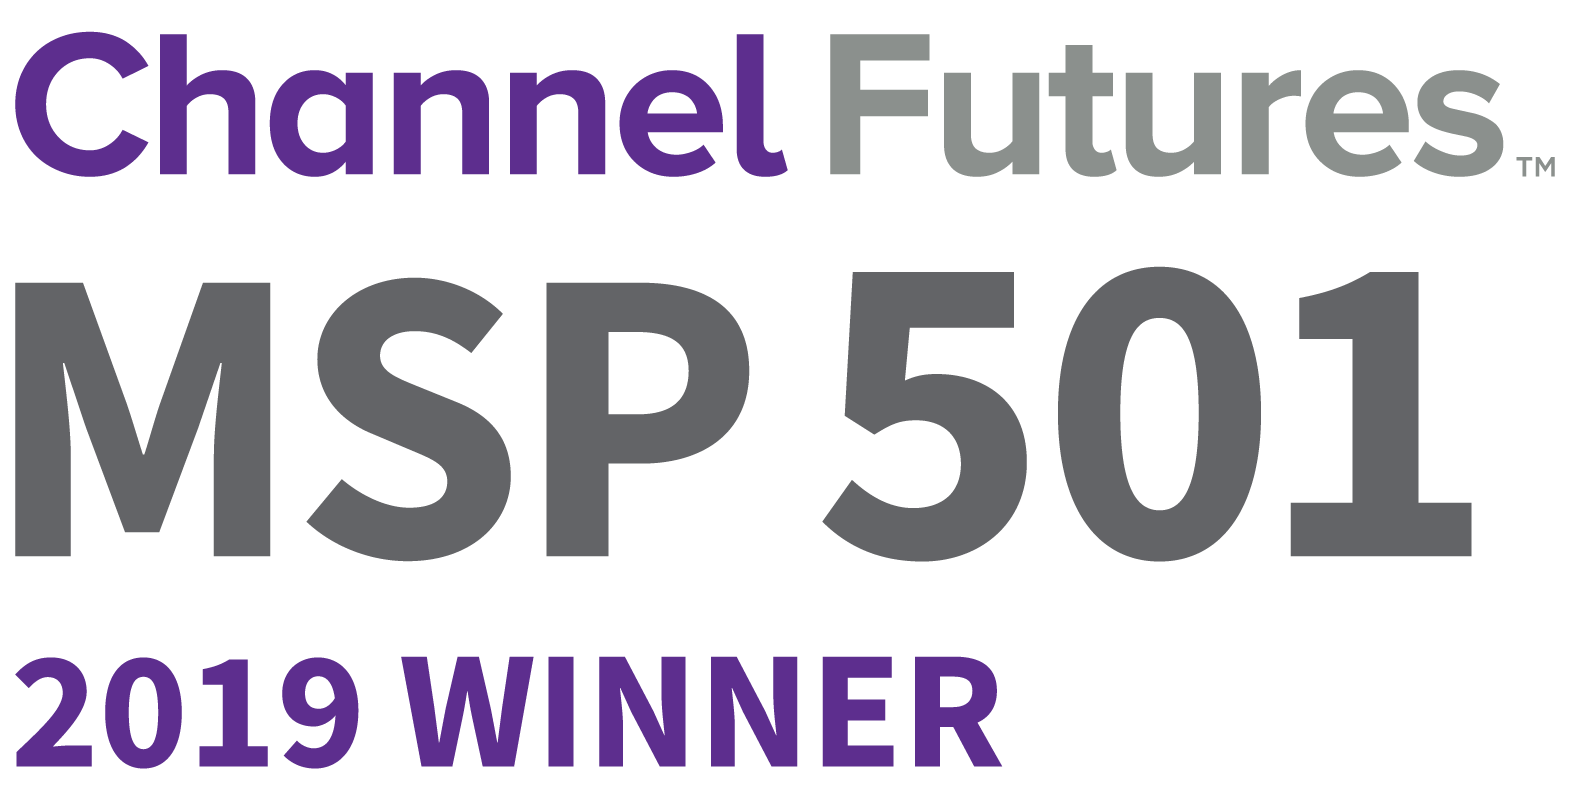 msp501 winner nobadge 2019 1